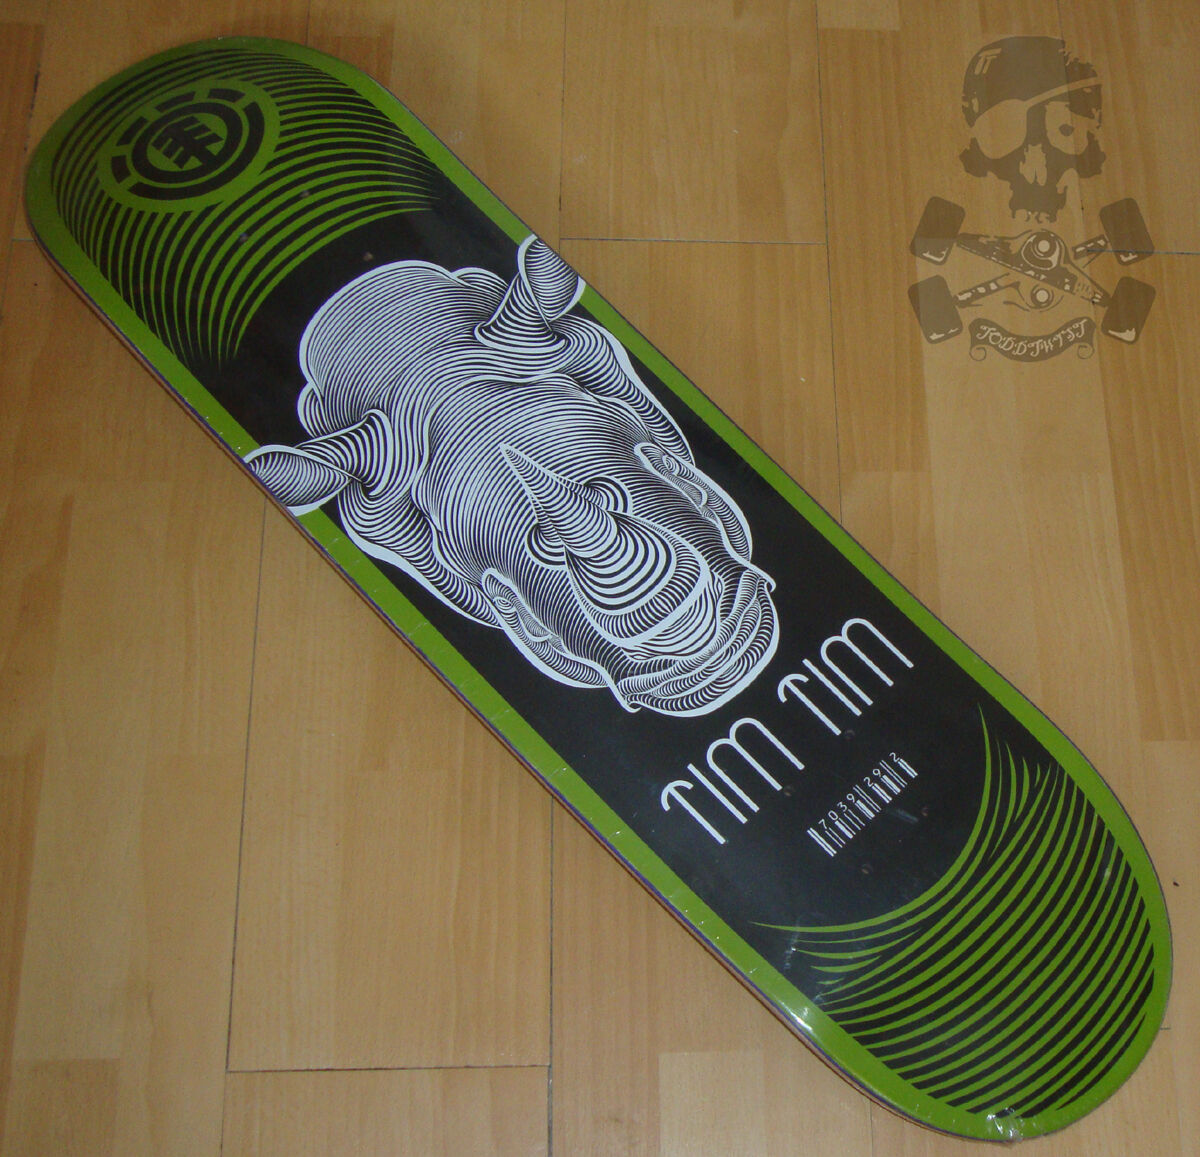 Element Tavola Skateboard TIM - Chad TIM Skateboard TIM - RINO IMPRINT 20.3cm larghezza 06efe7